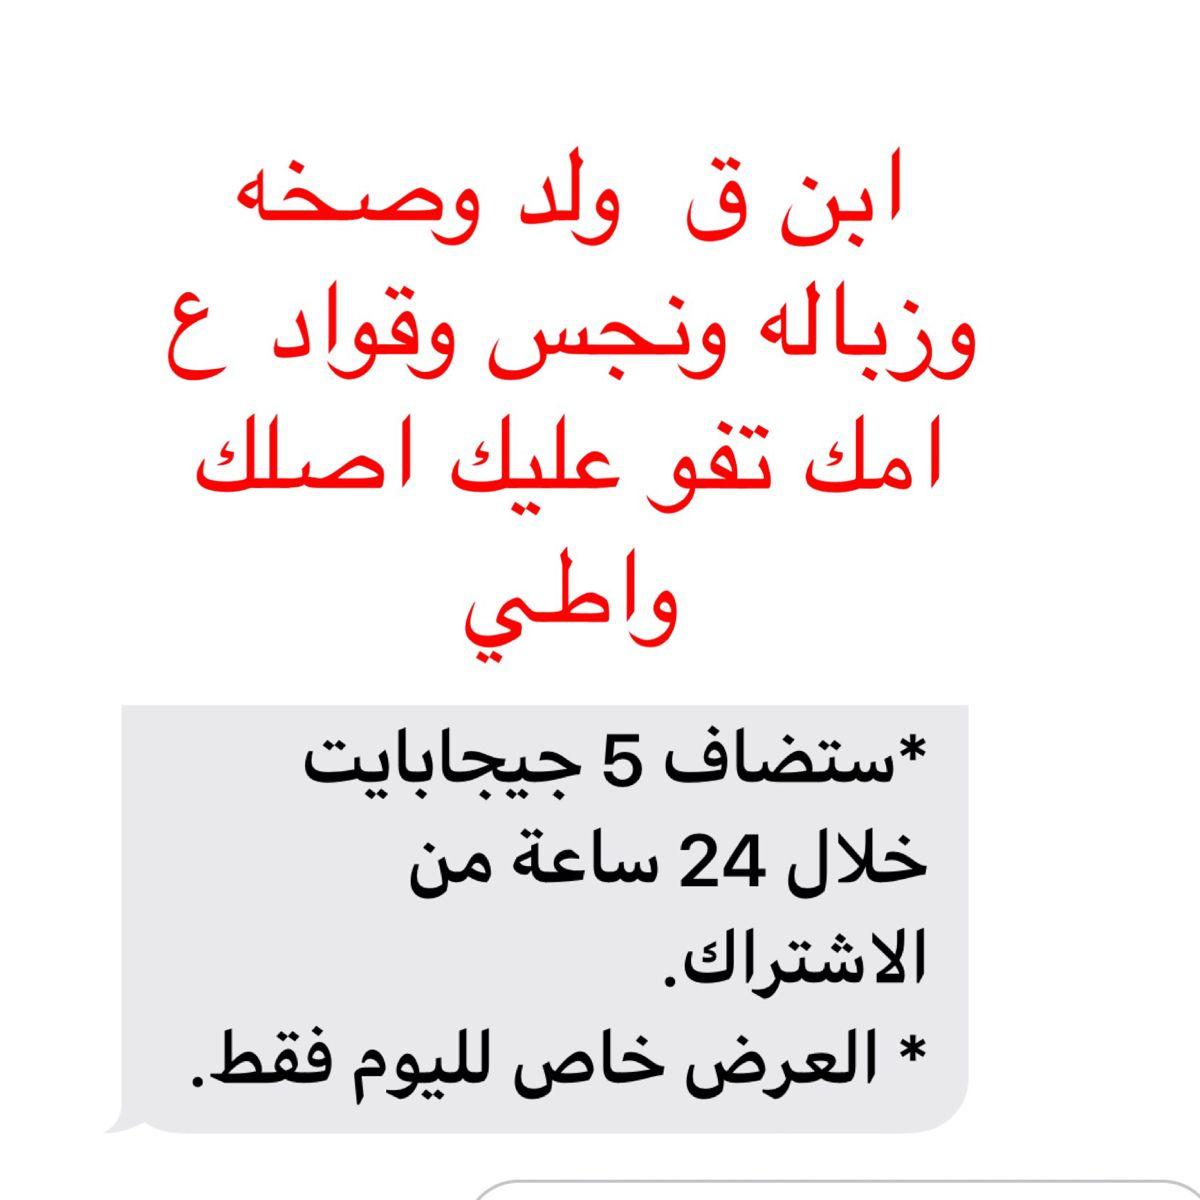 تفو ع ابوك Math Arabic Calligraphy Math Equations